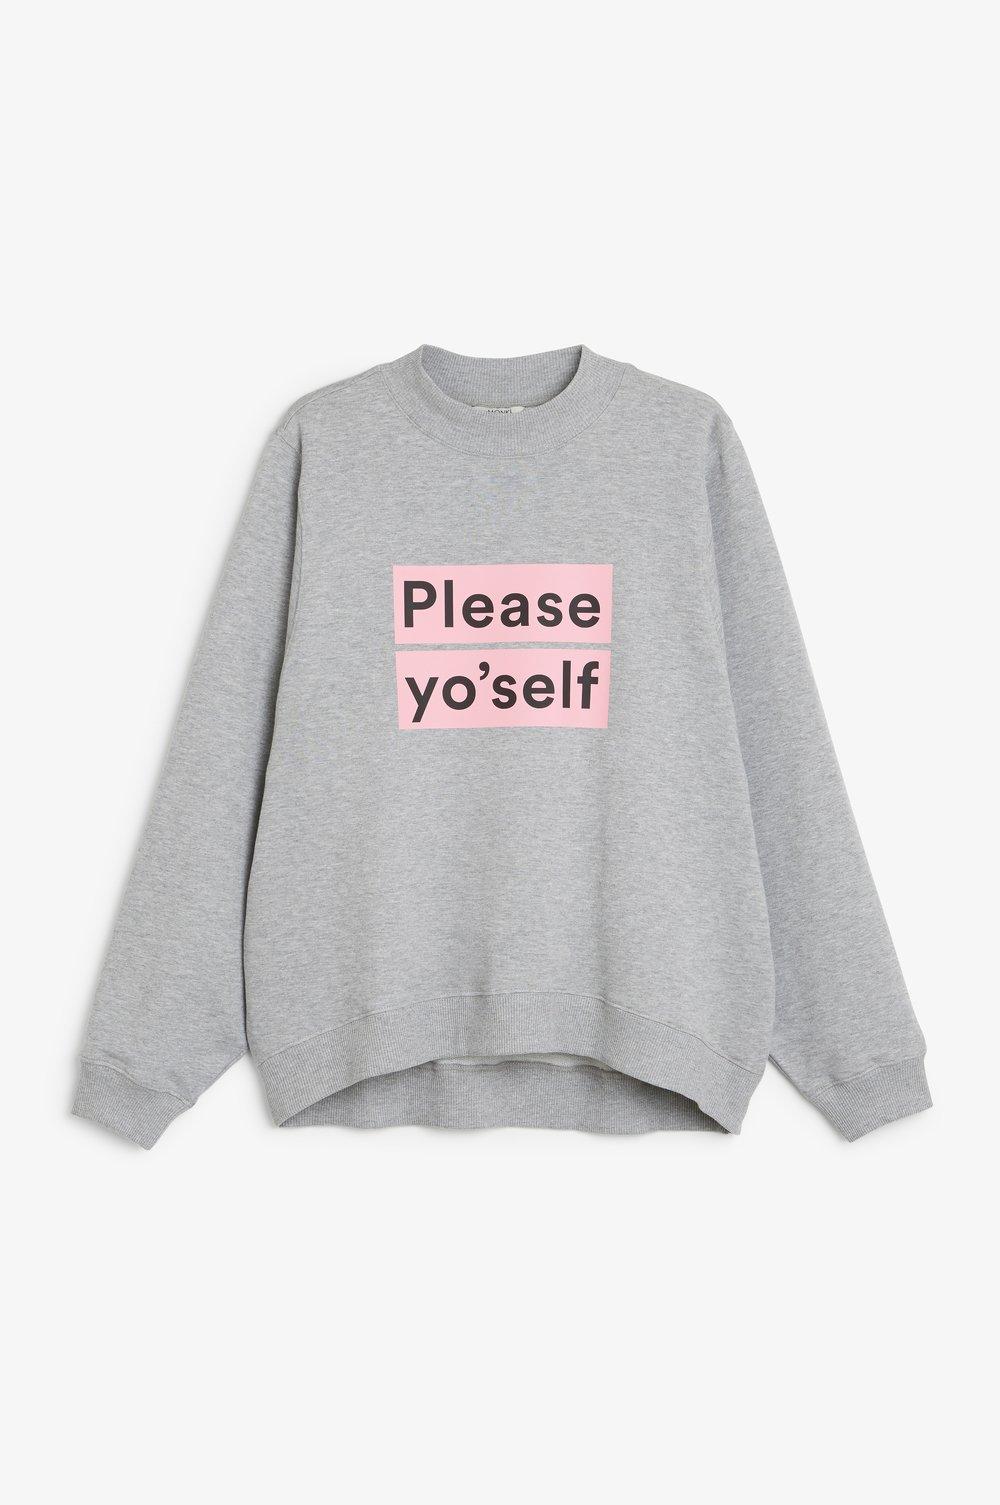 please_yoself_sweat[1].jpg